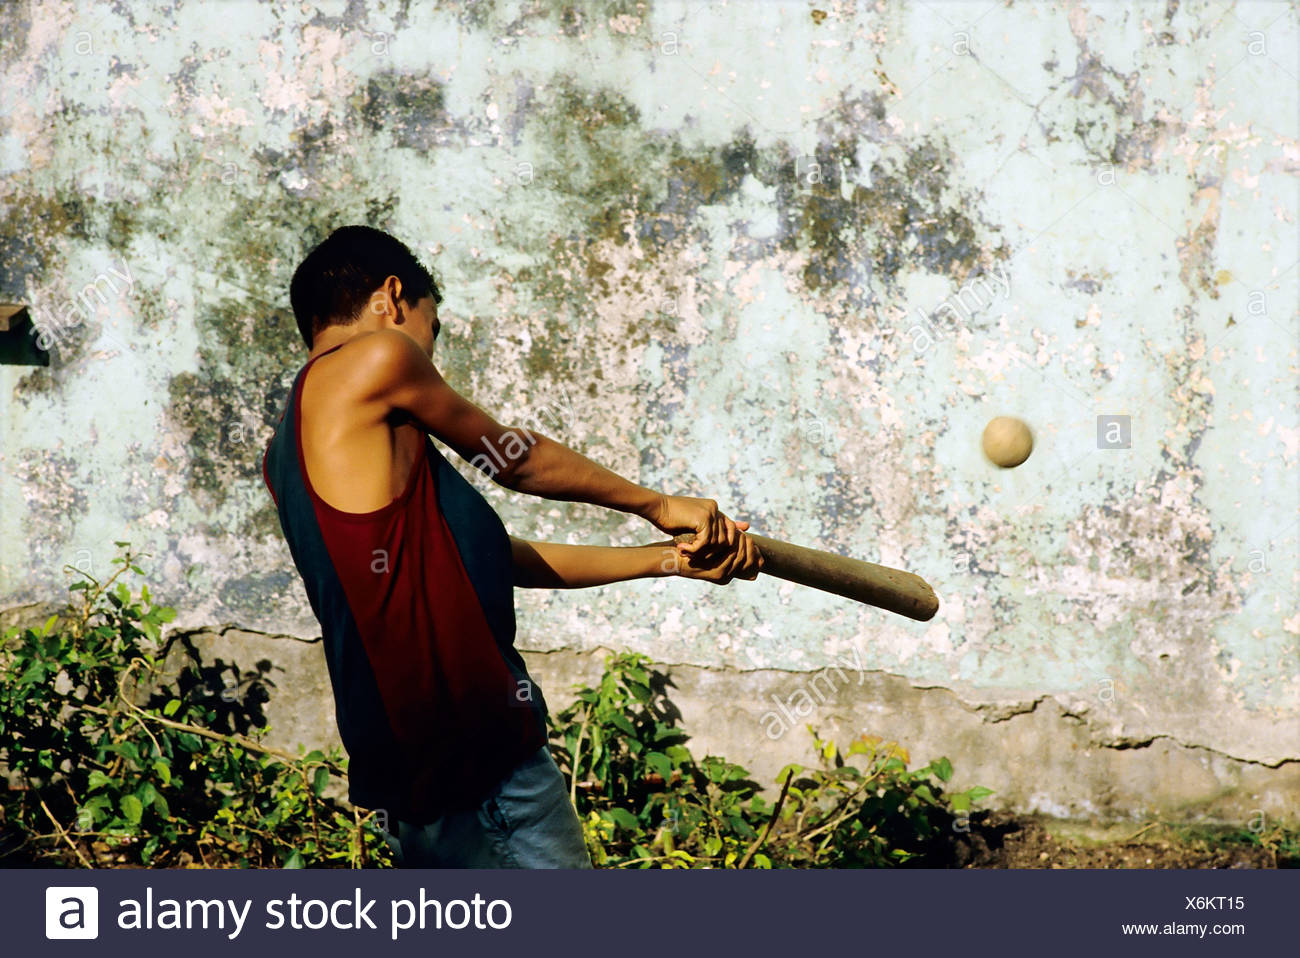 Boy hitting a ball with a baseball bat in front of a weathered house wall, Centro Habana, Havana, Cuba, Caribbean - Stock Image